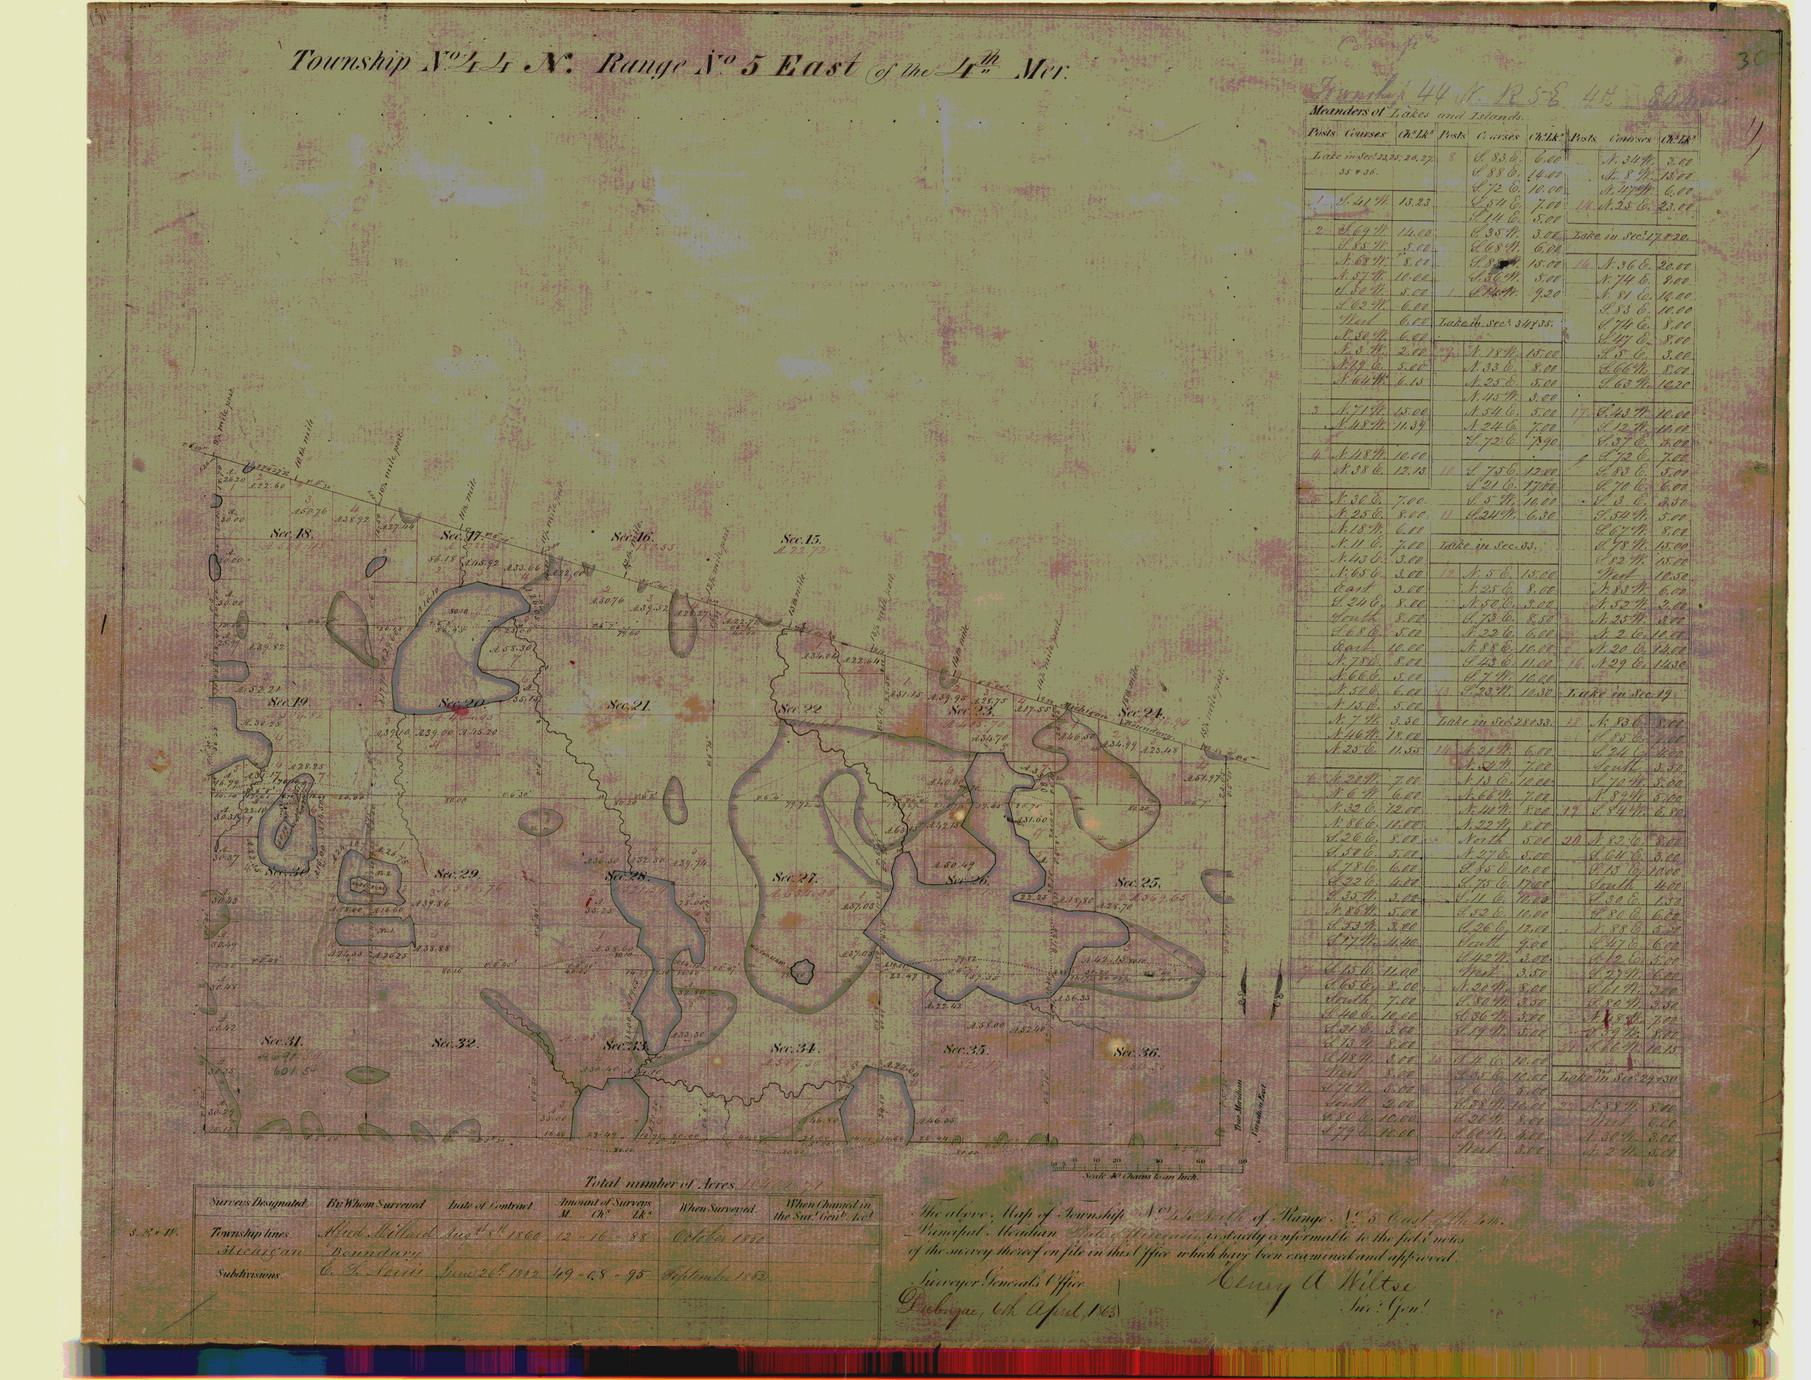 [Public Land Survey System map: Wisconsin Township 44 North, Range 05 East]